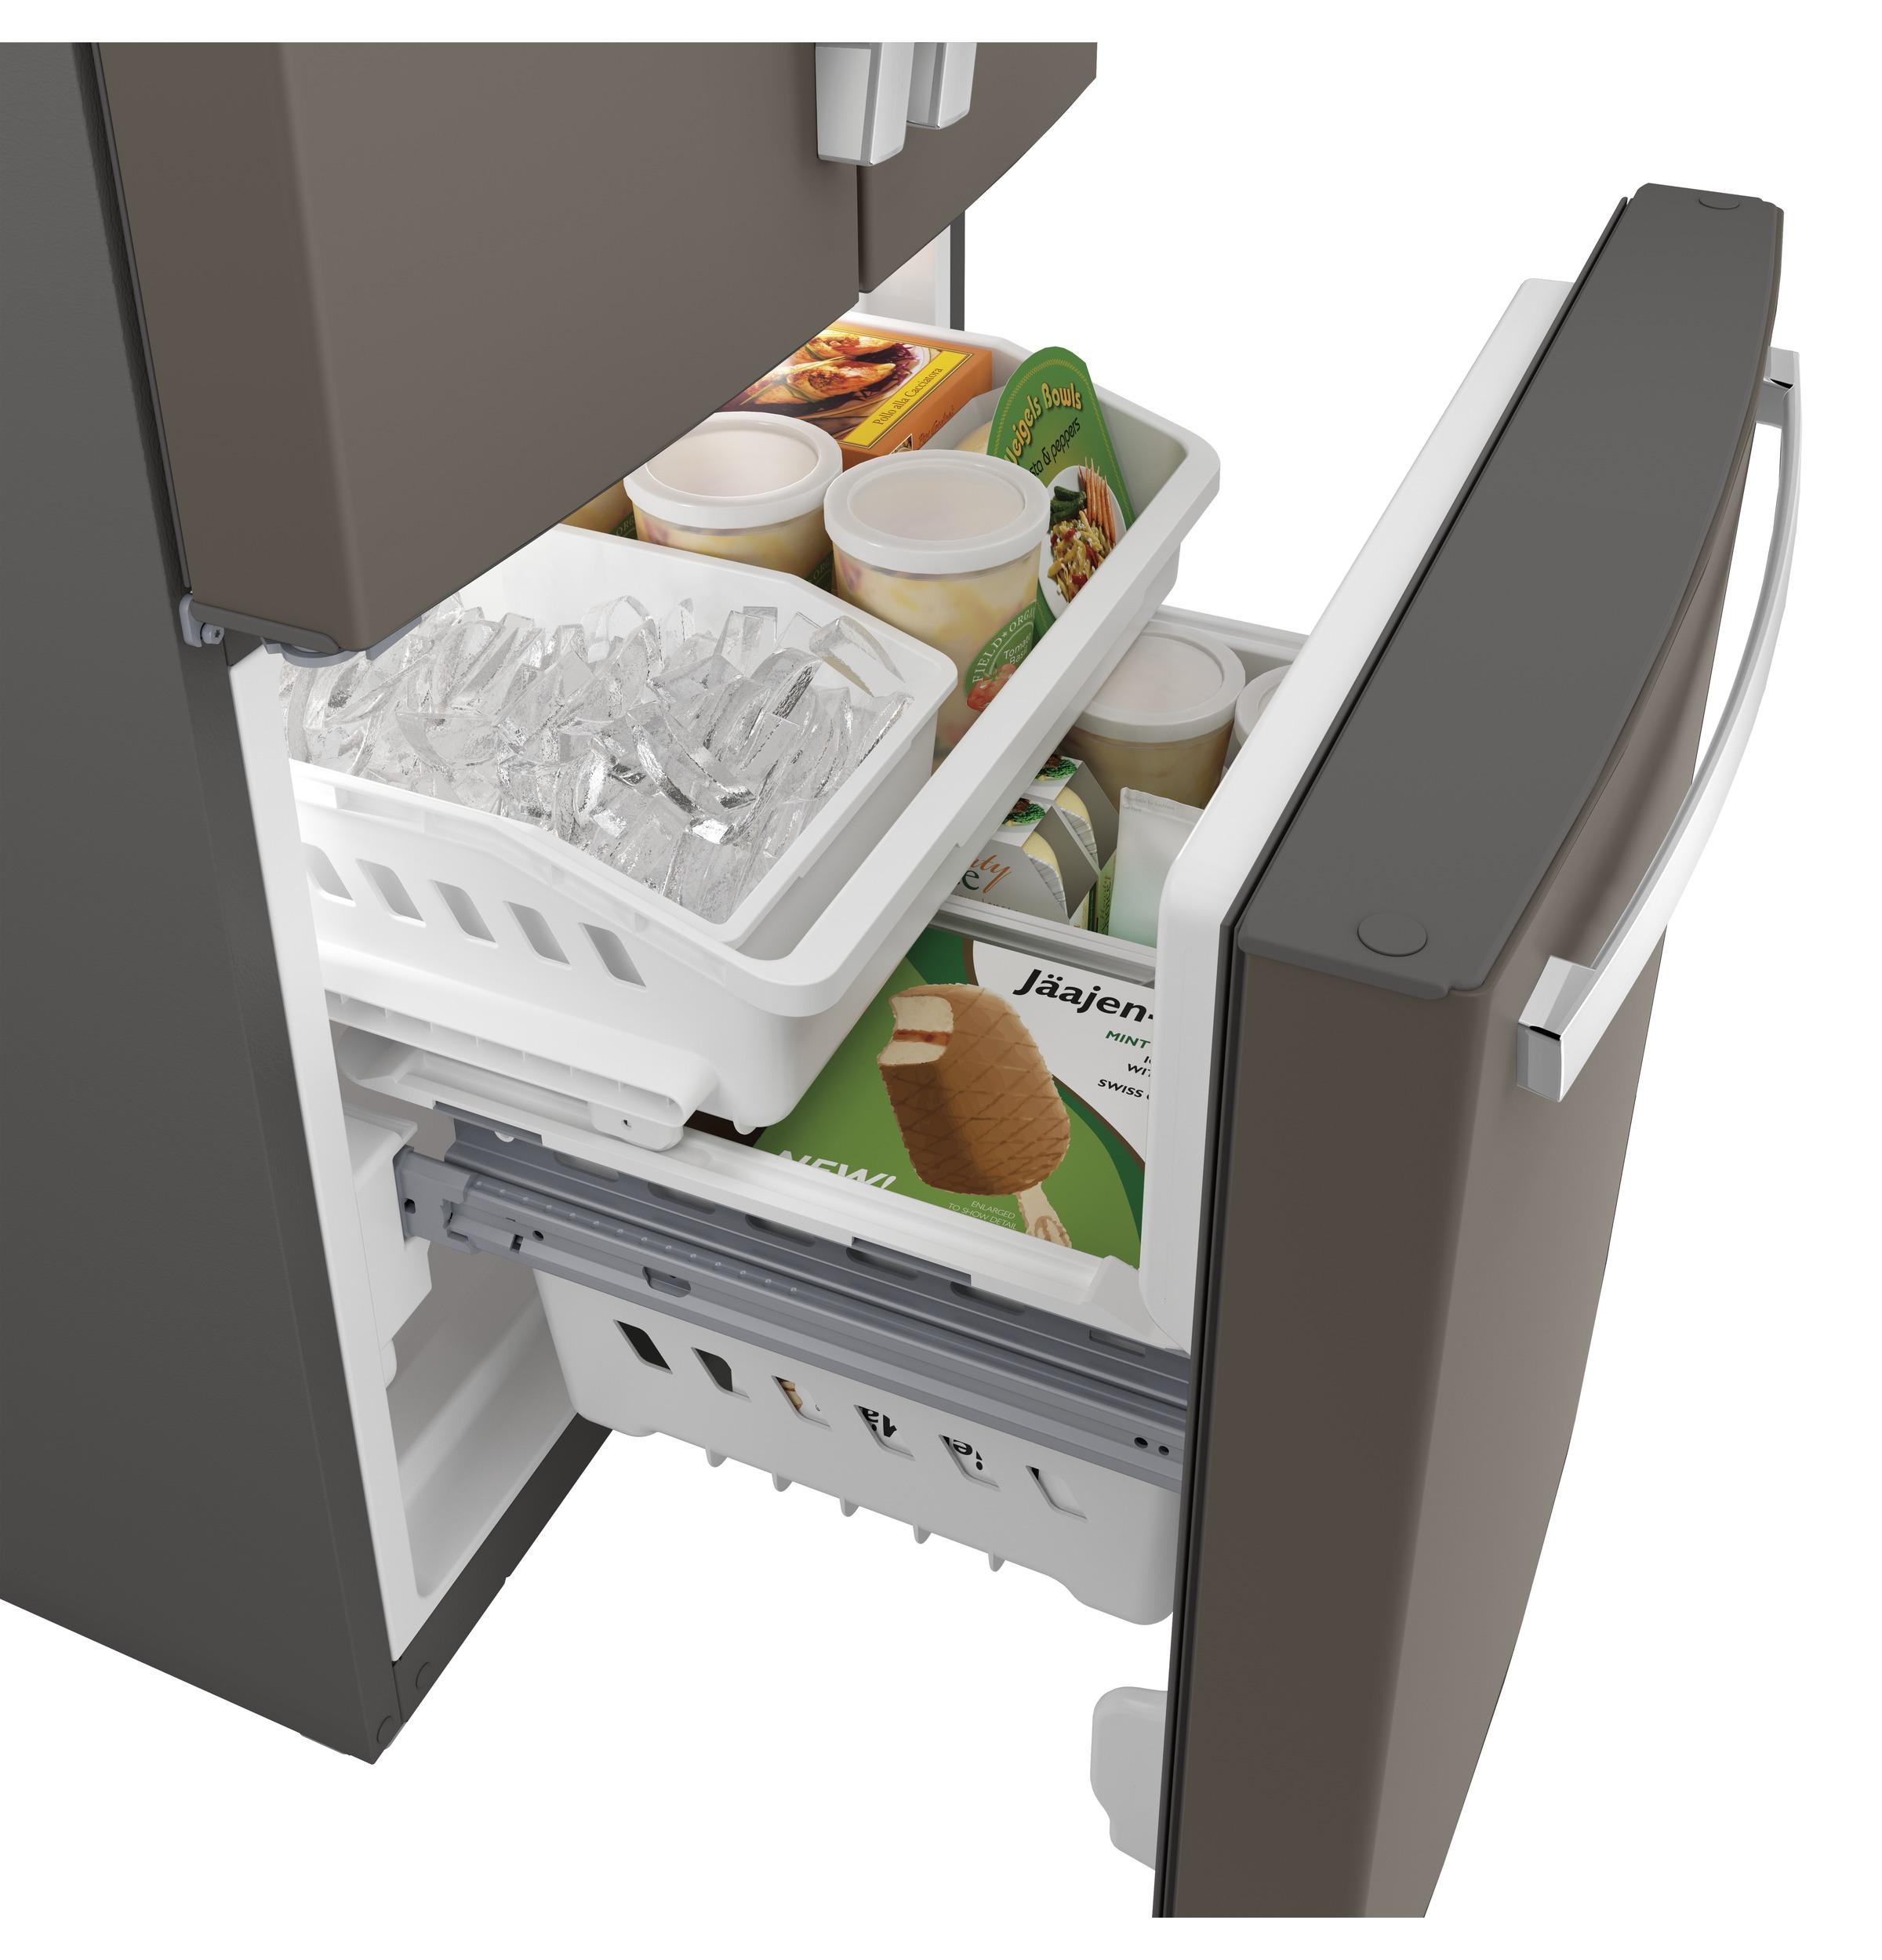 Model: GNE21FMKES   GE GE® ENERGY STAR® 20.8 Cu. Ft. French-Door Refrigerator